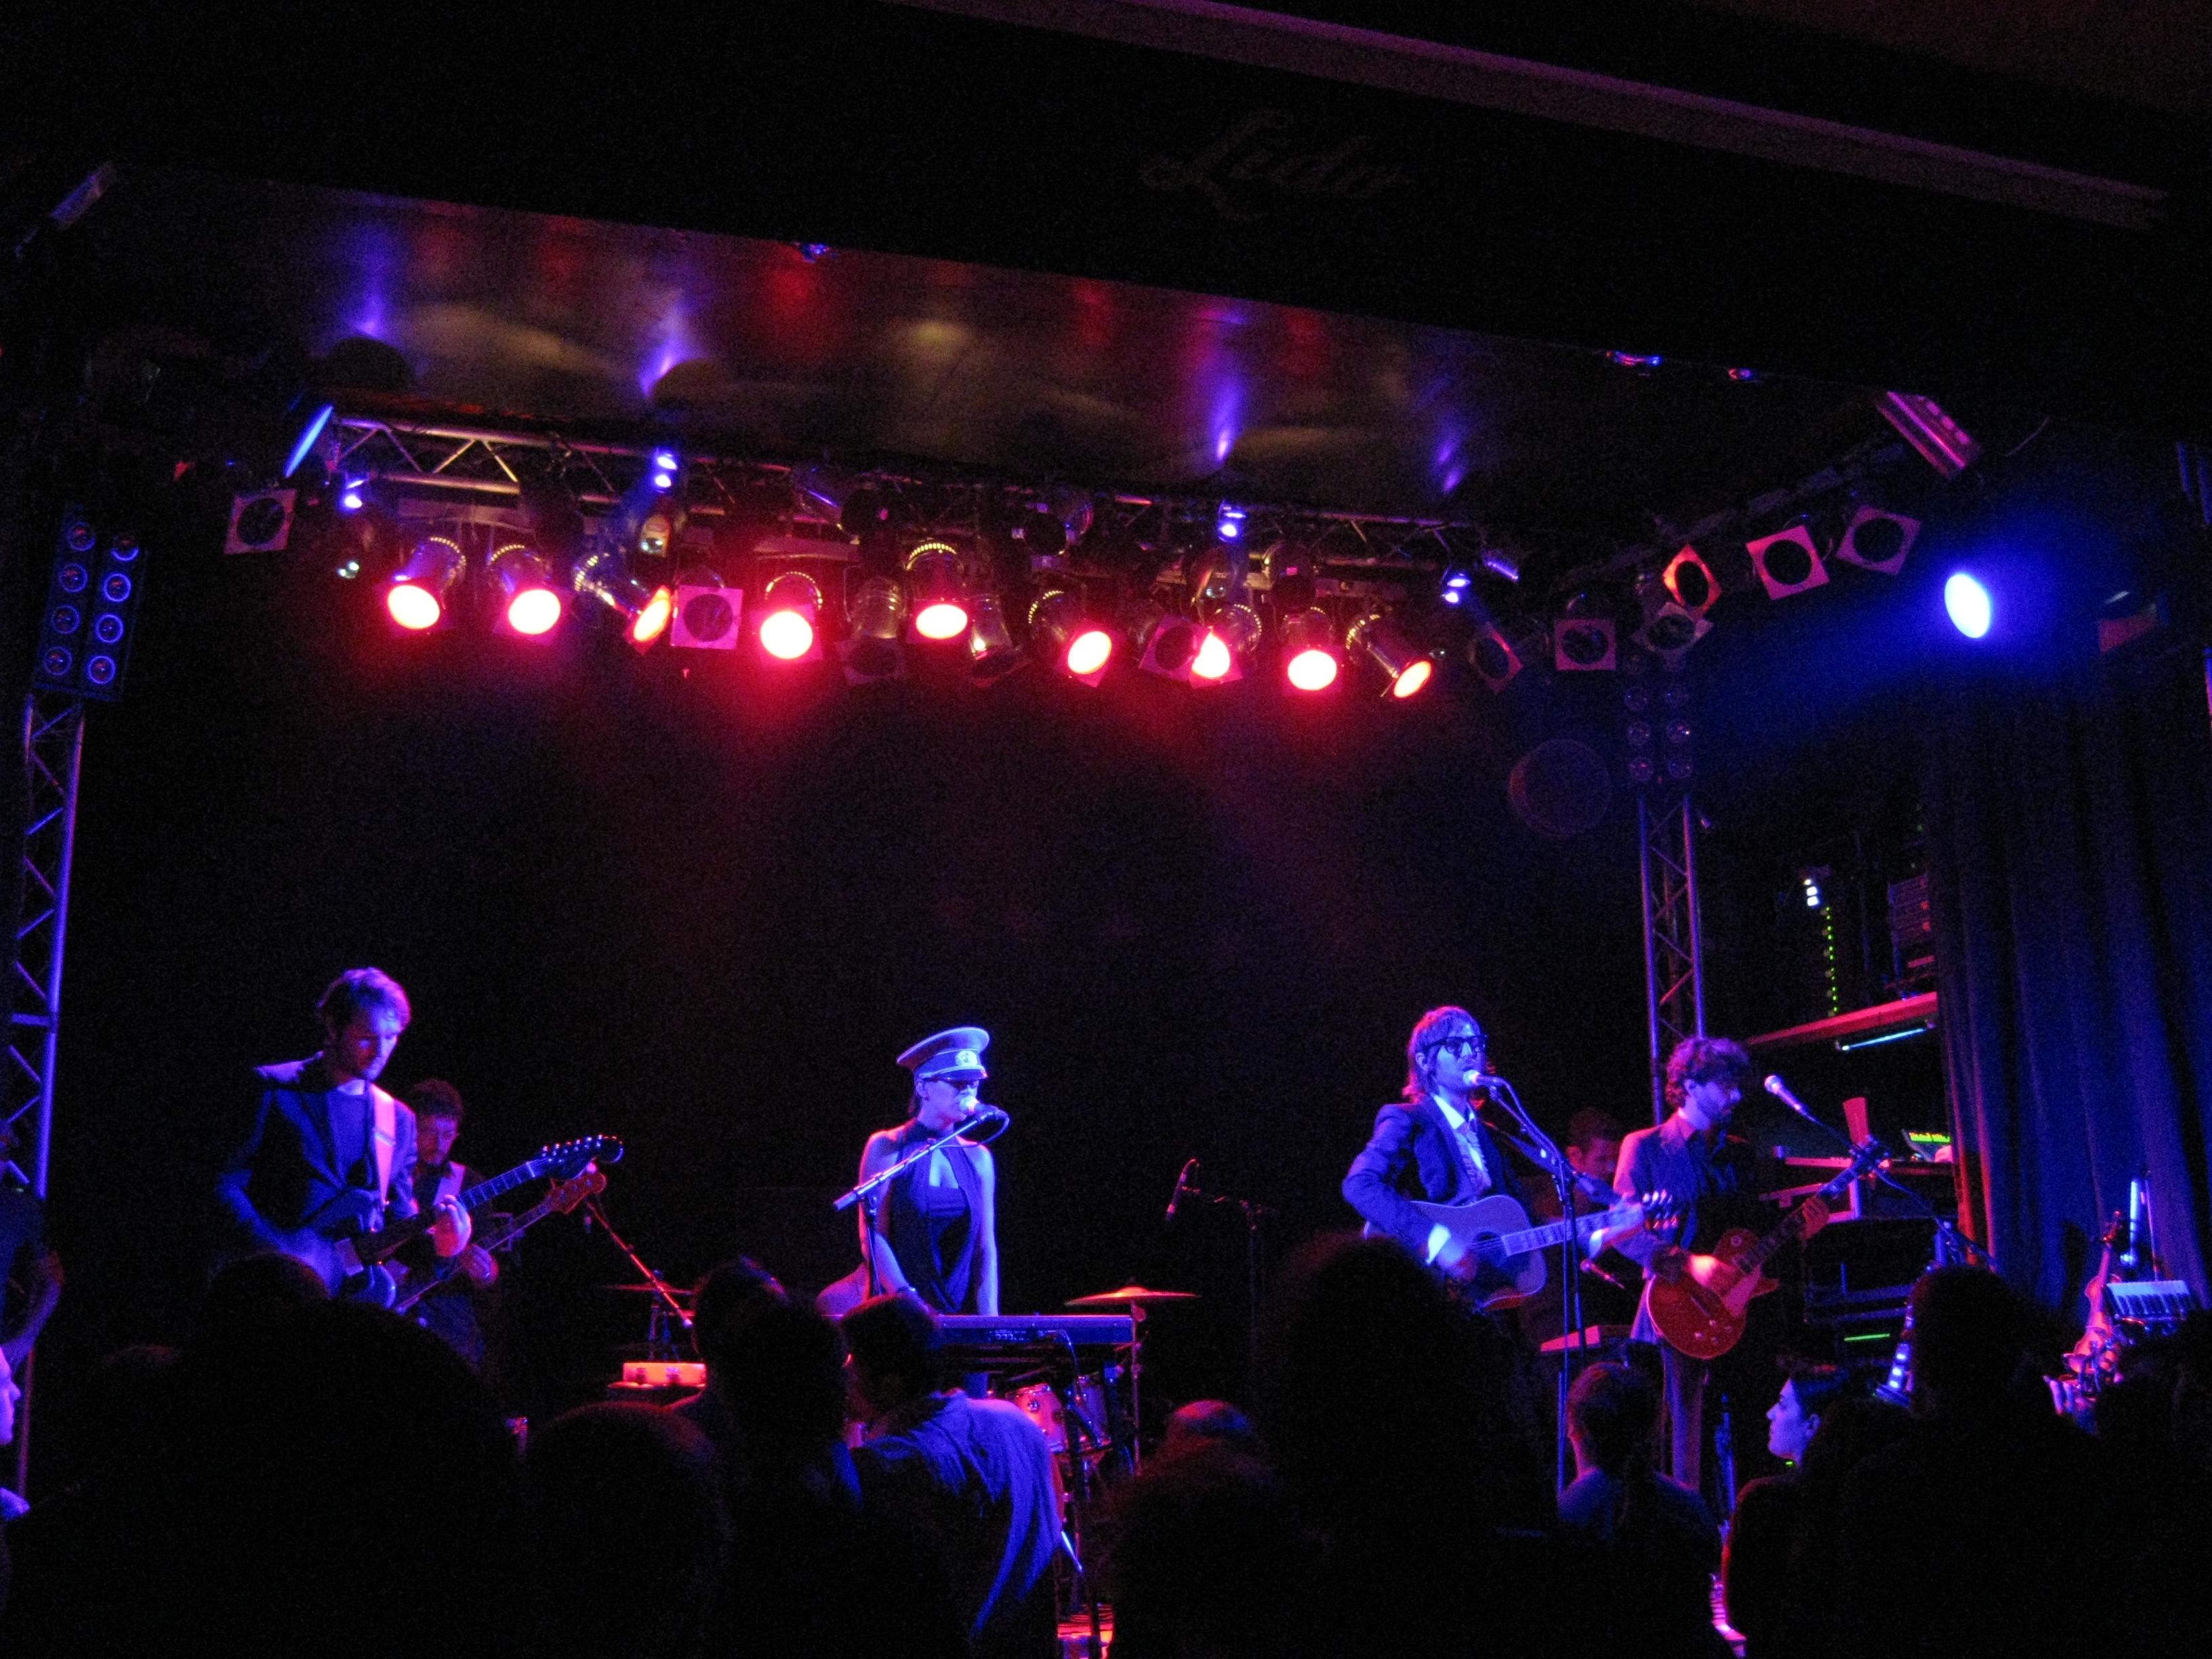 Concert de Baustelle à Berlin en 2008